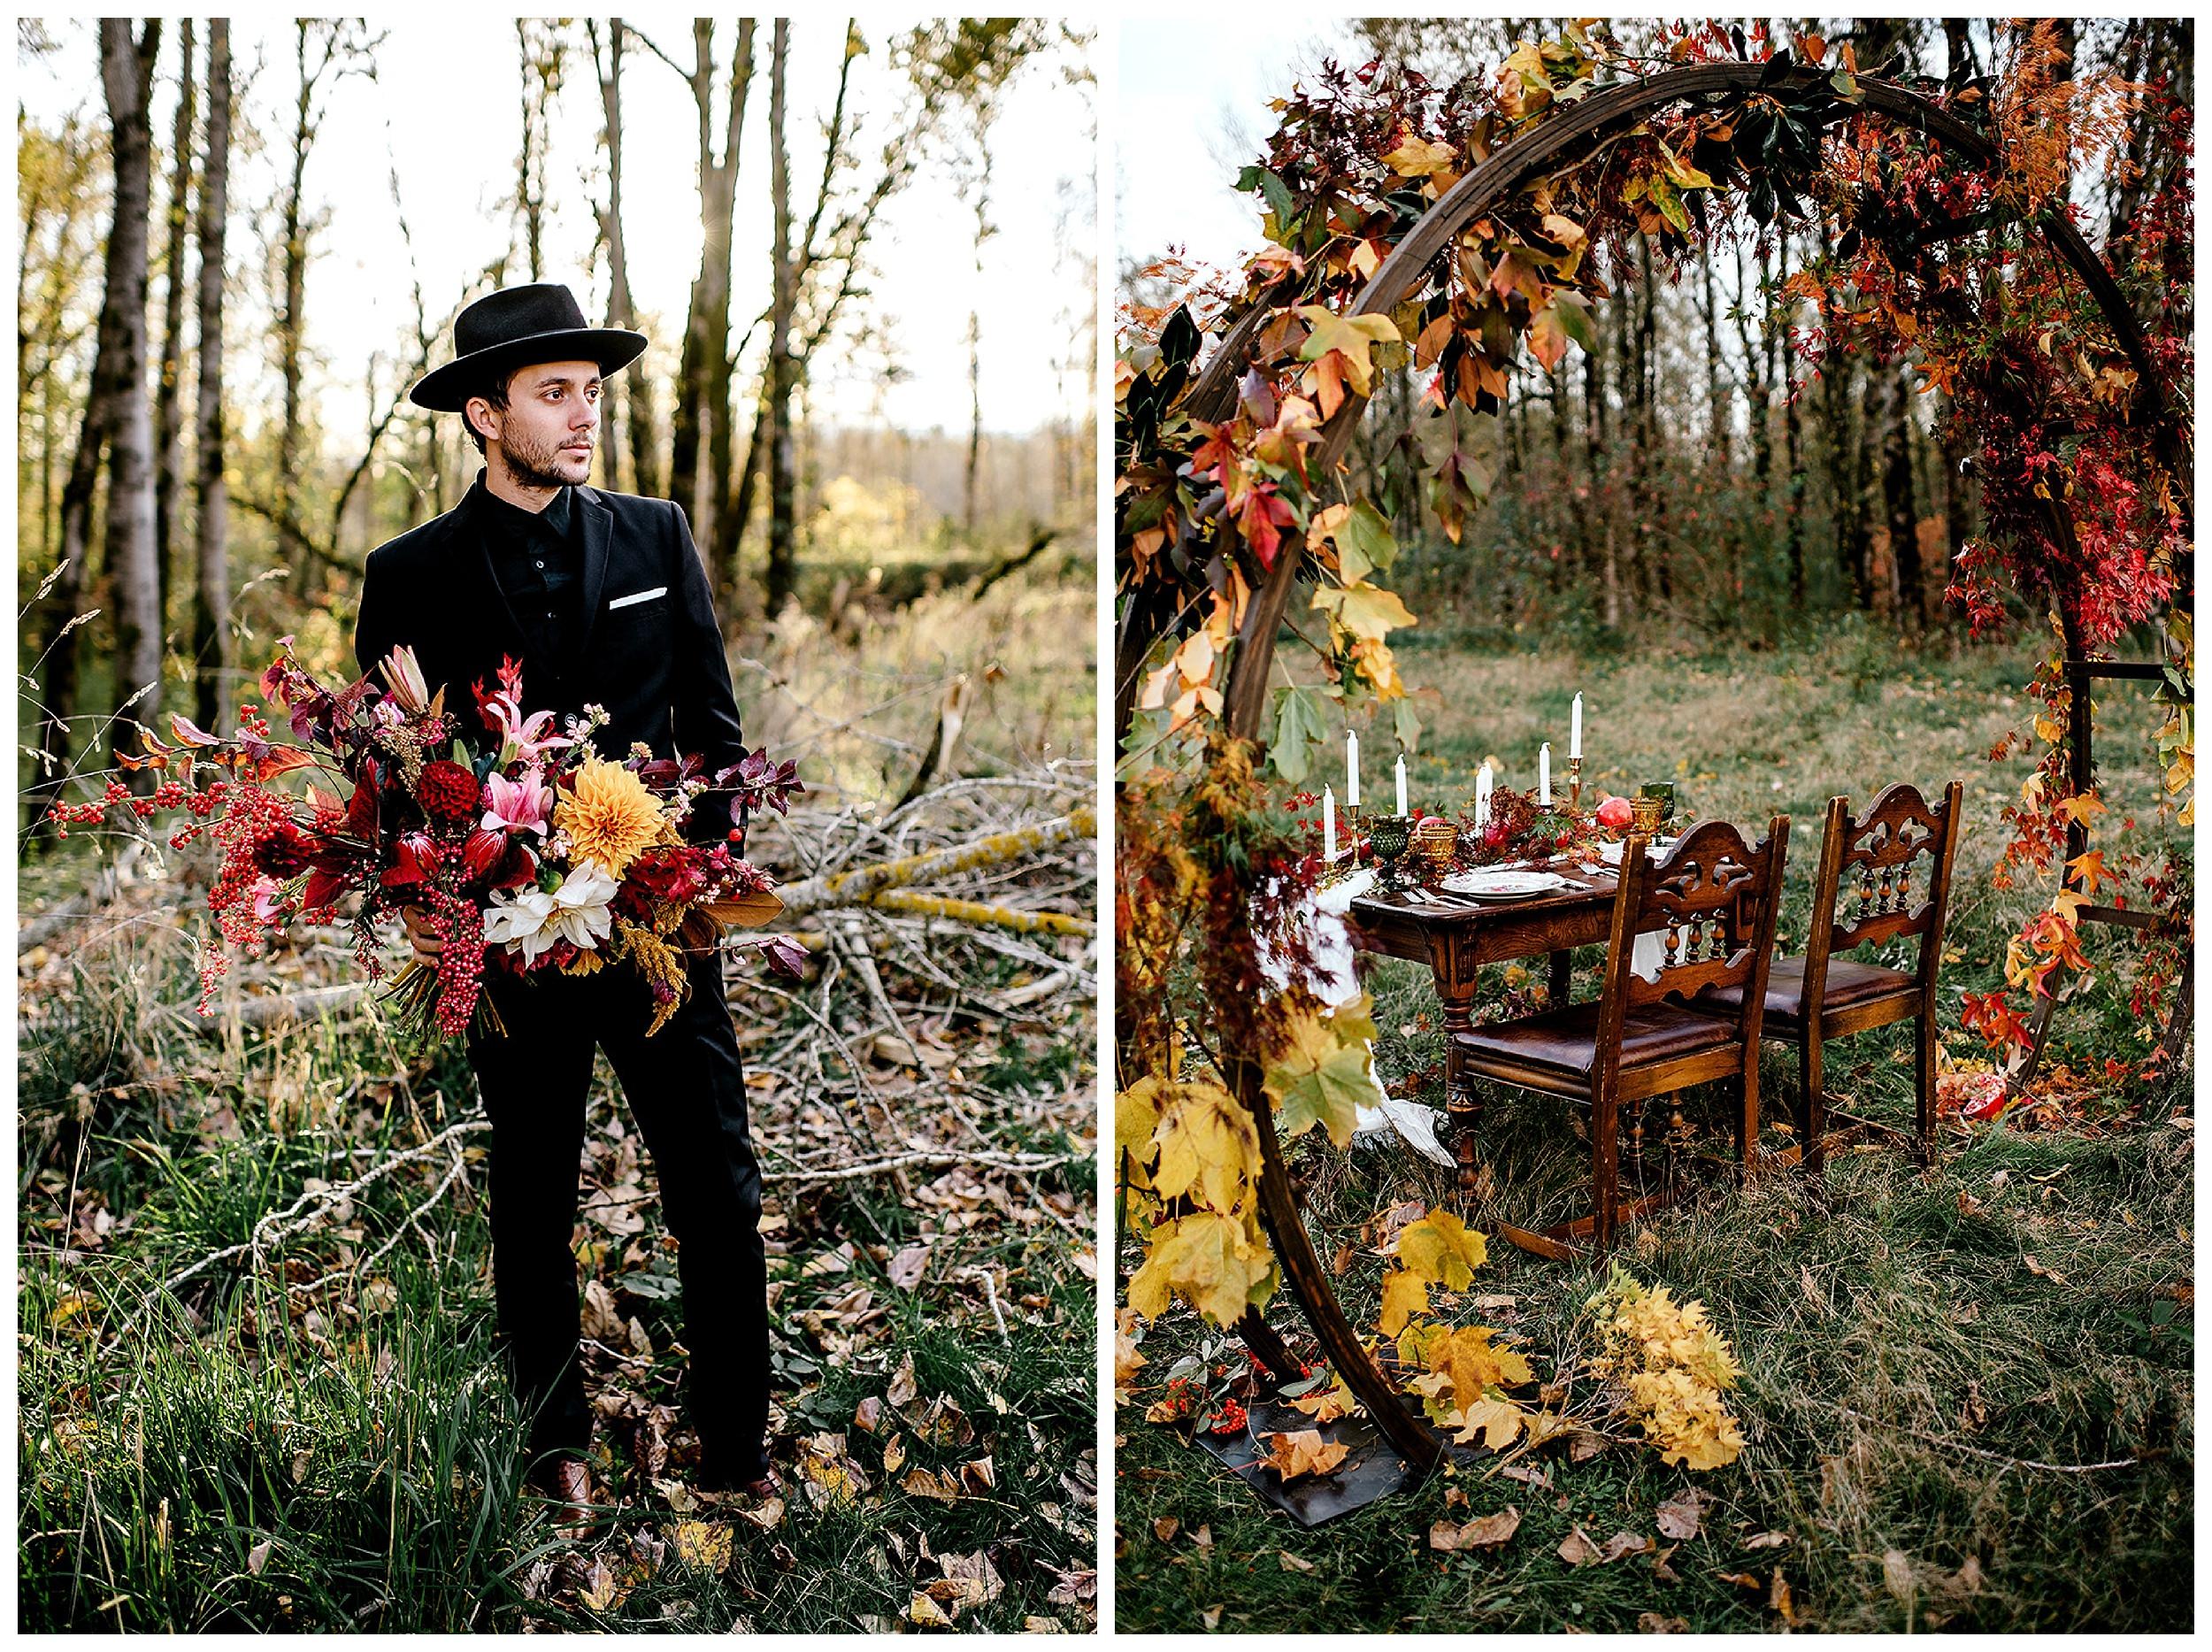 Portland-elopement-photographer-Autunm-wedding-inspiration-02.jpg